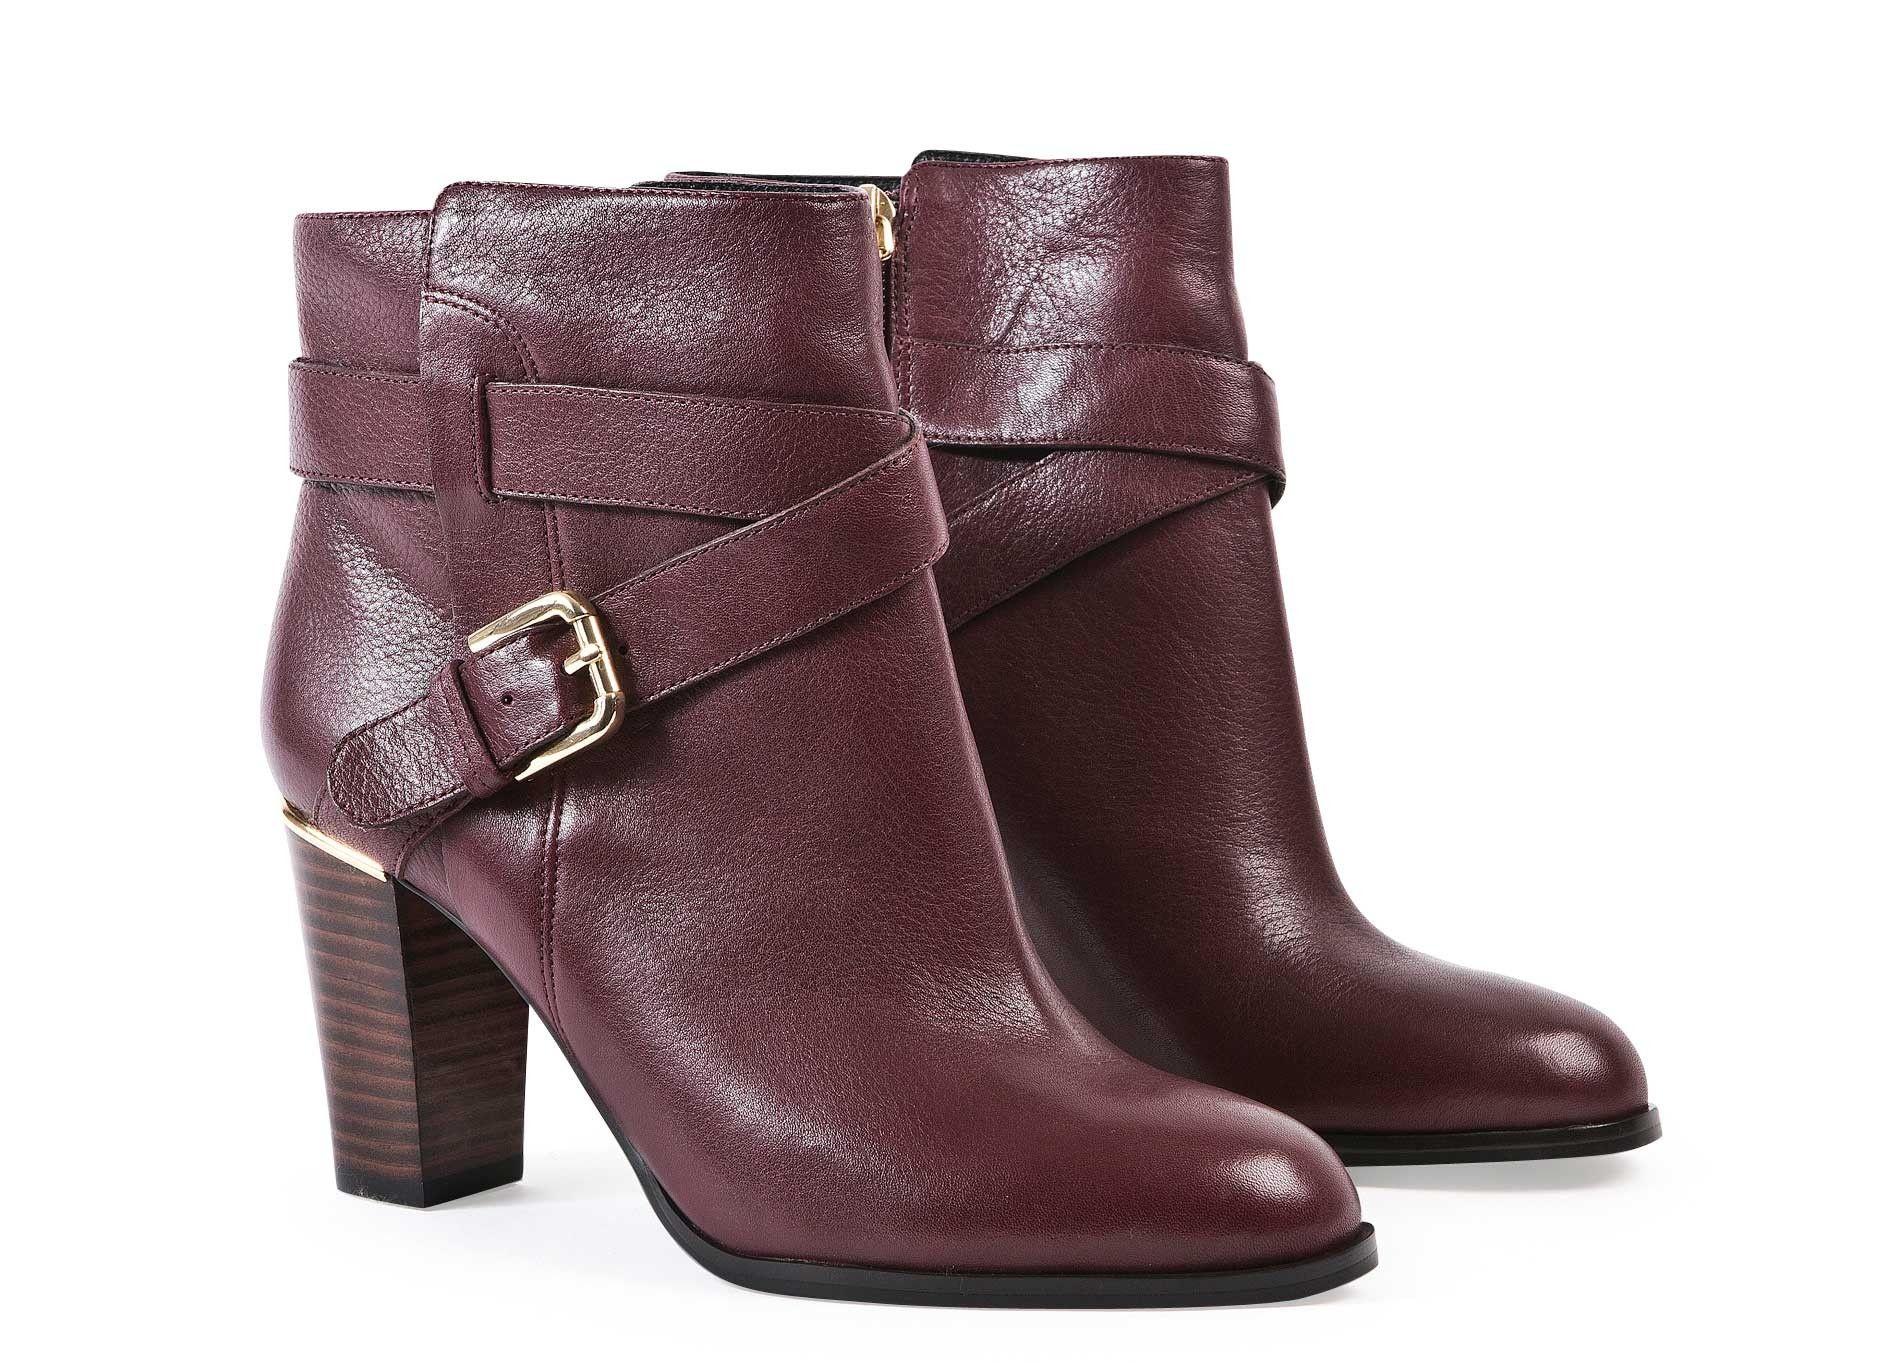 BootsShoes Fashion Fascination Cuir AndreLook Boots Et XiPwOTZulk